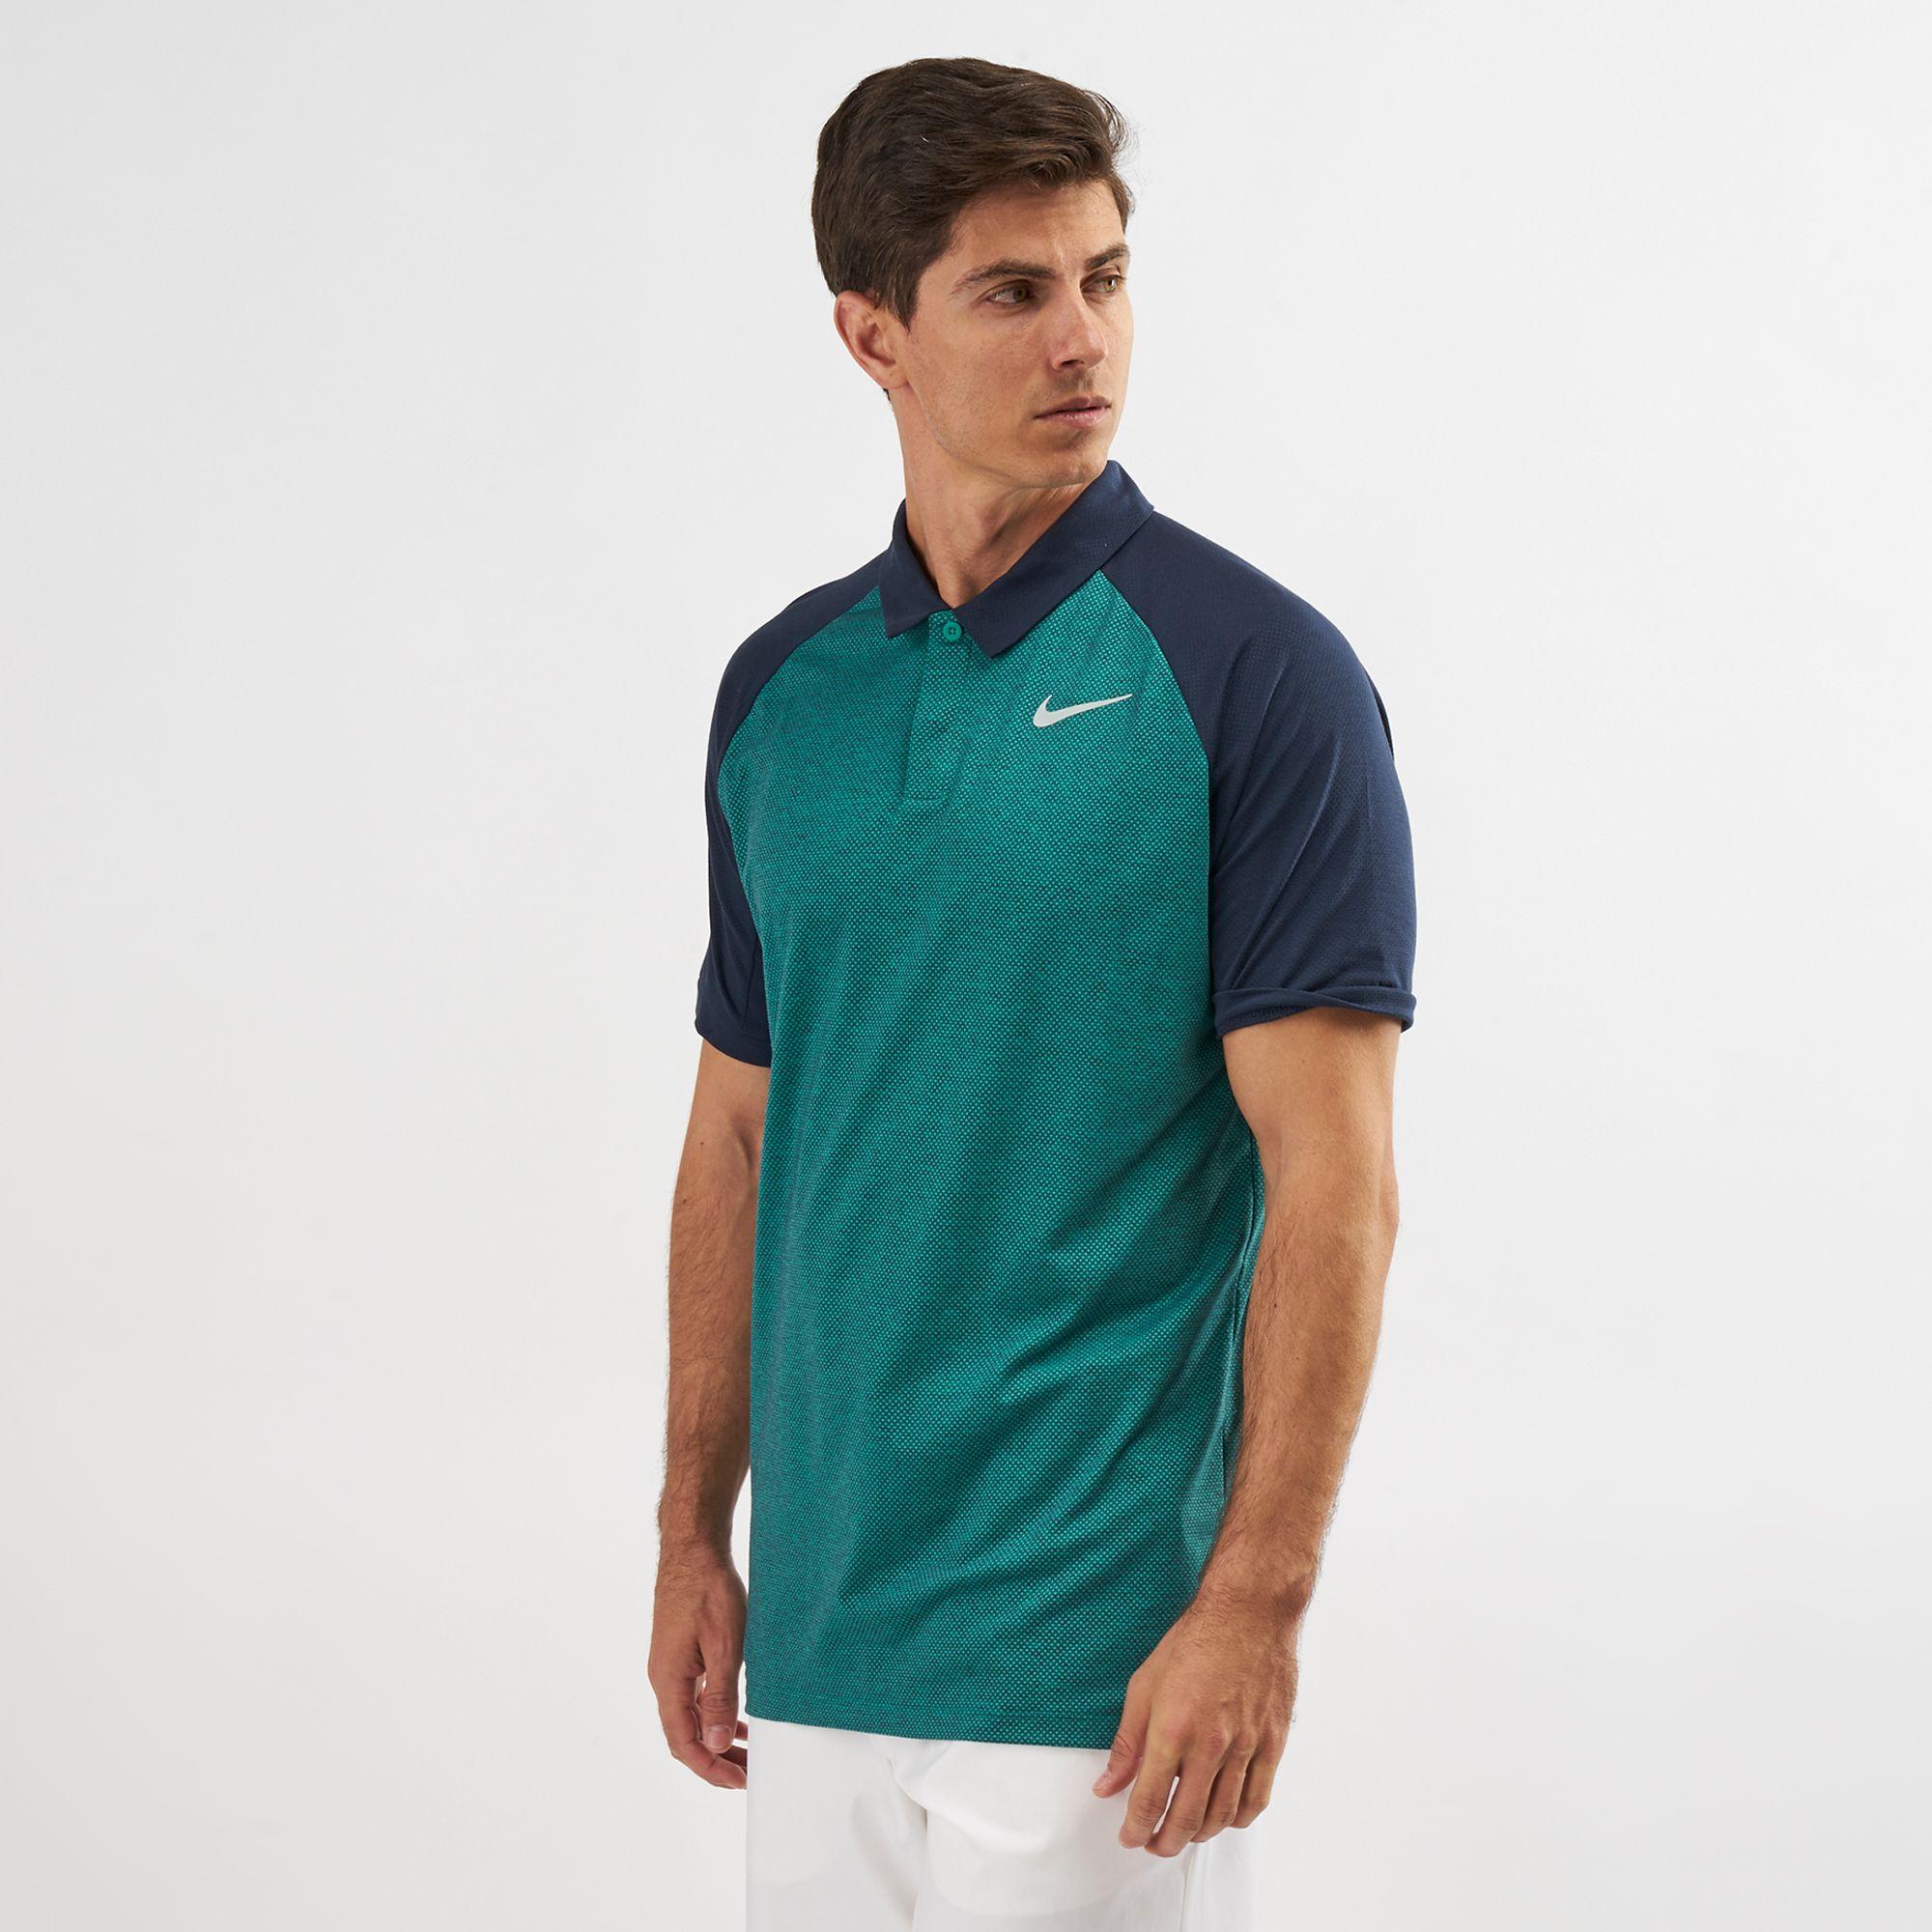 Nike Golf Dri Fit Graphic Polo Shirt Bcd Tofu House